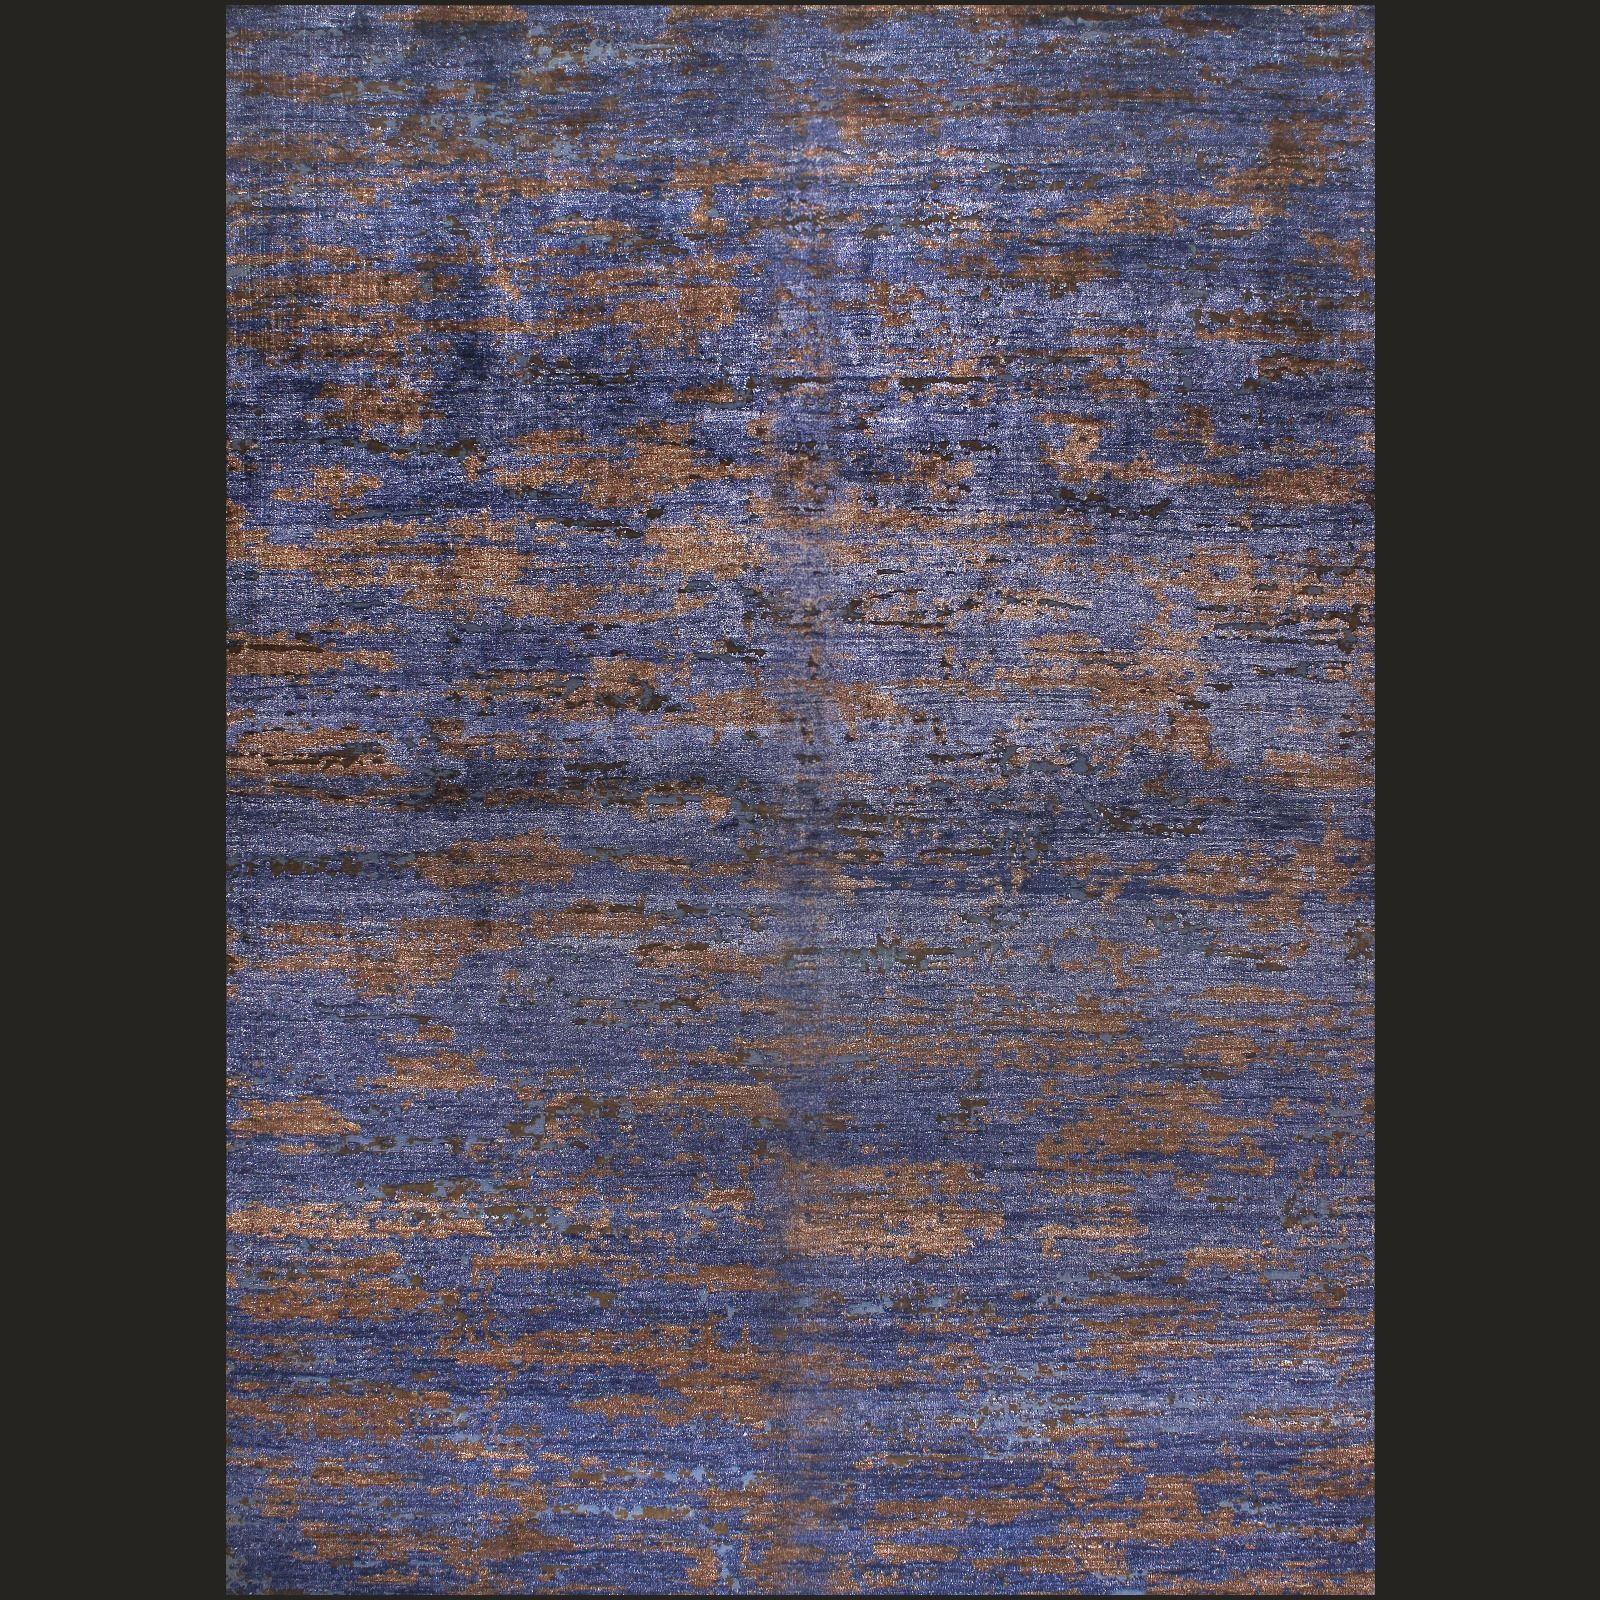 26218 topas modern classic design teppich blau kupfer von talis teppiche - Teppich Design Modern